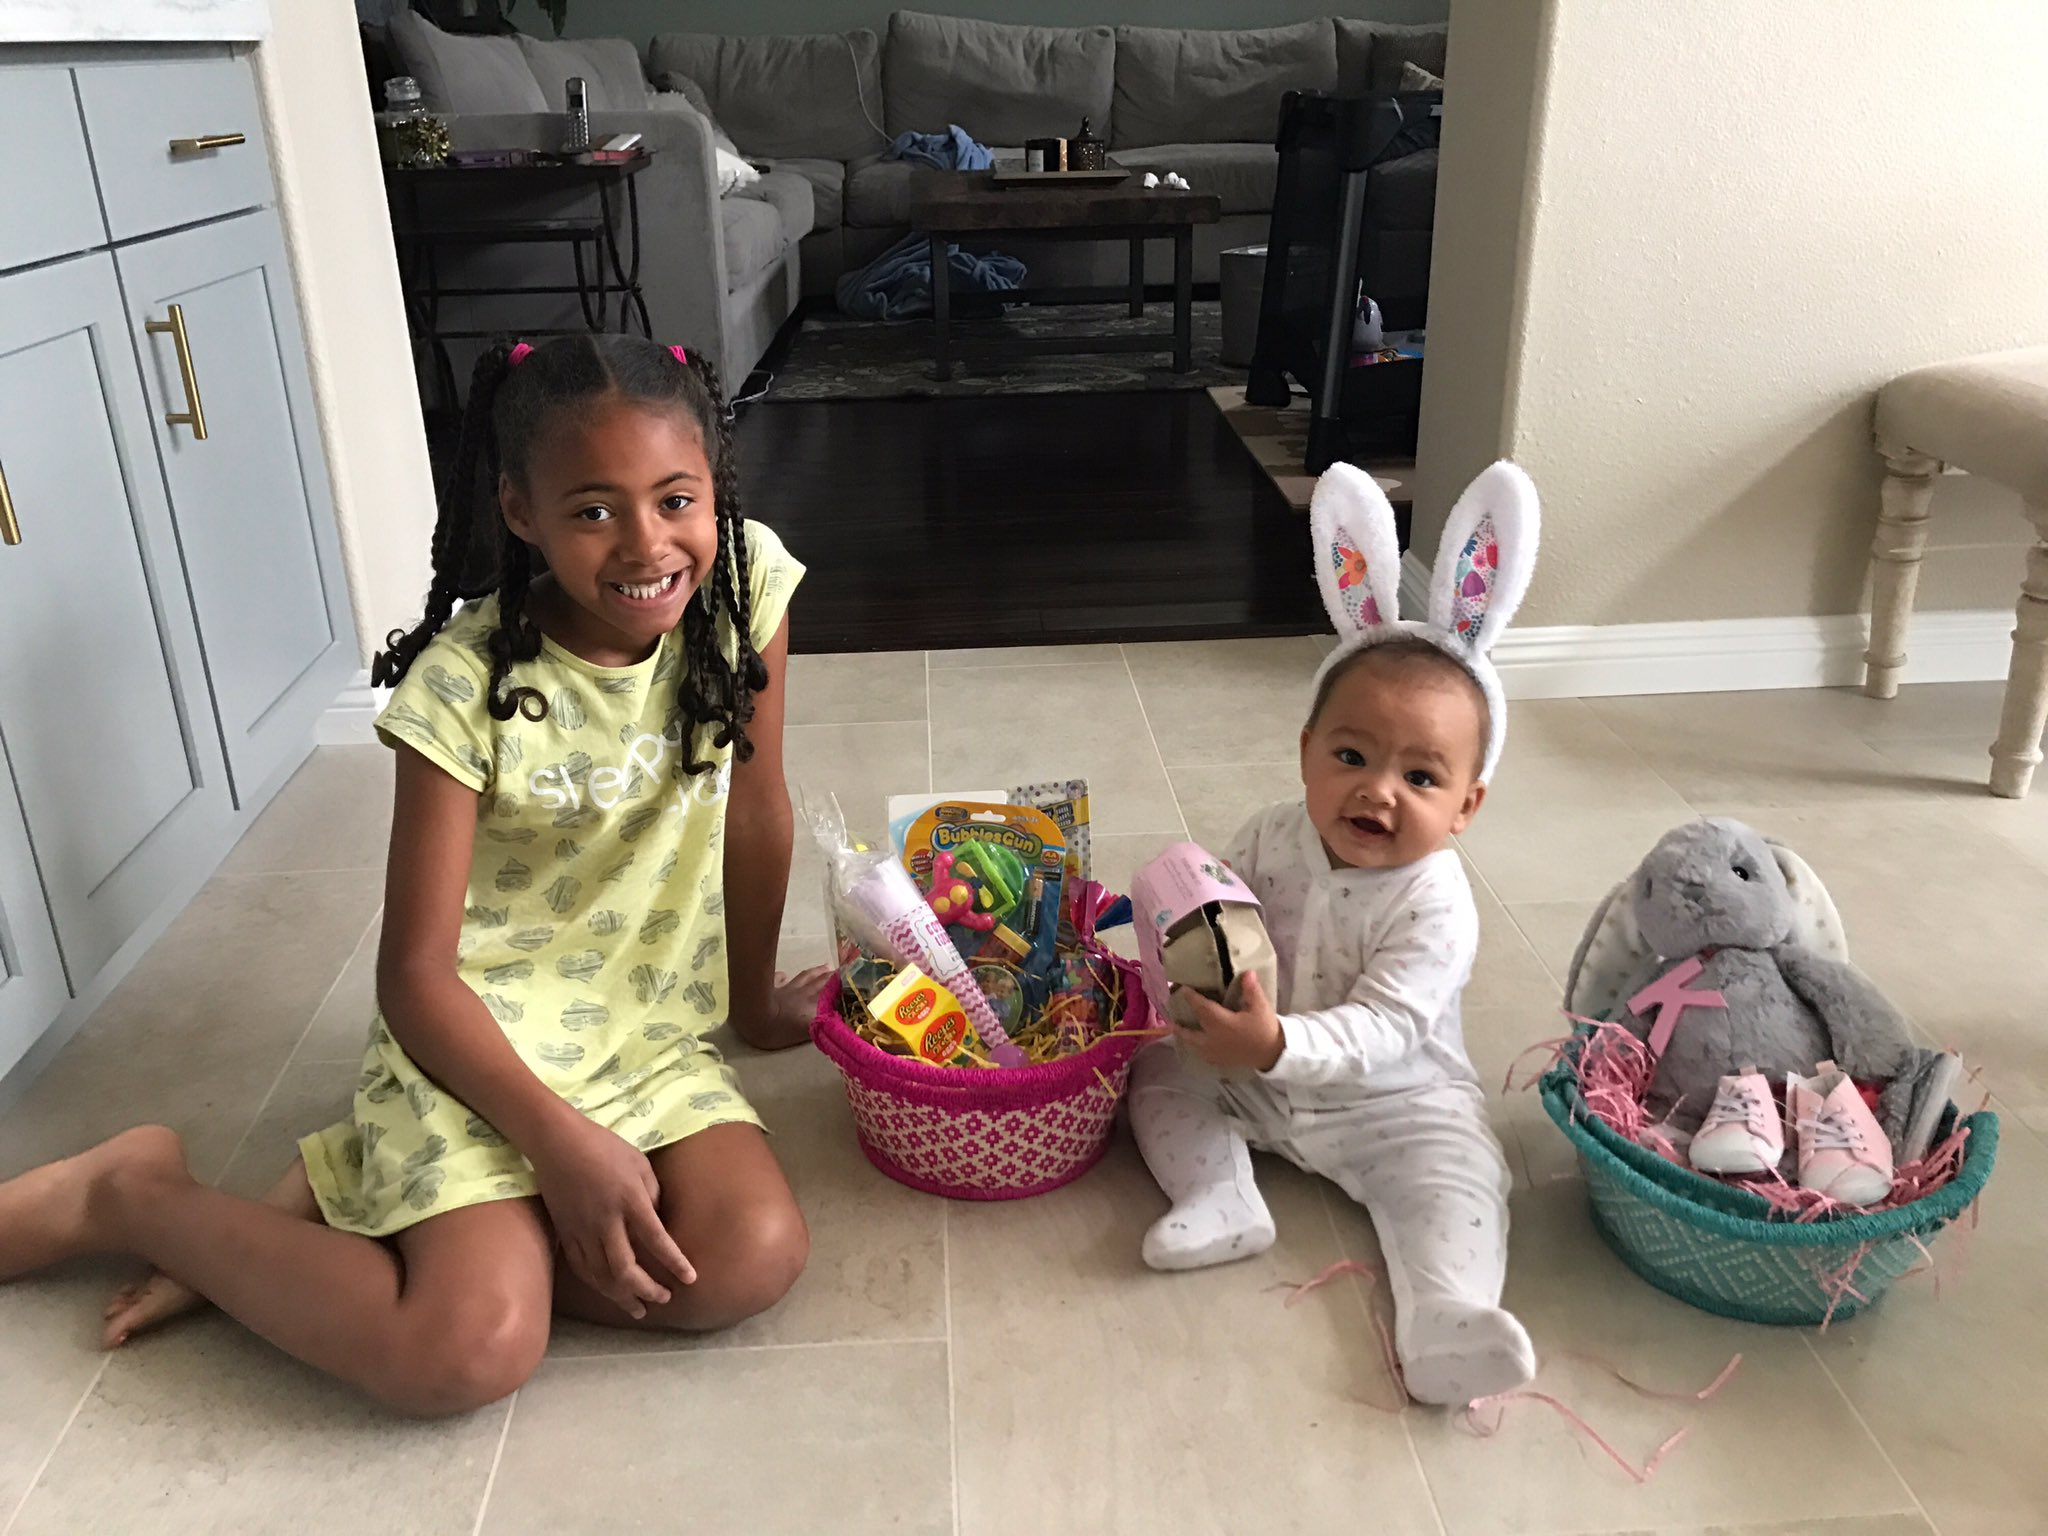 Happy Easter! https://t.co/GF6LiXQq2H